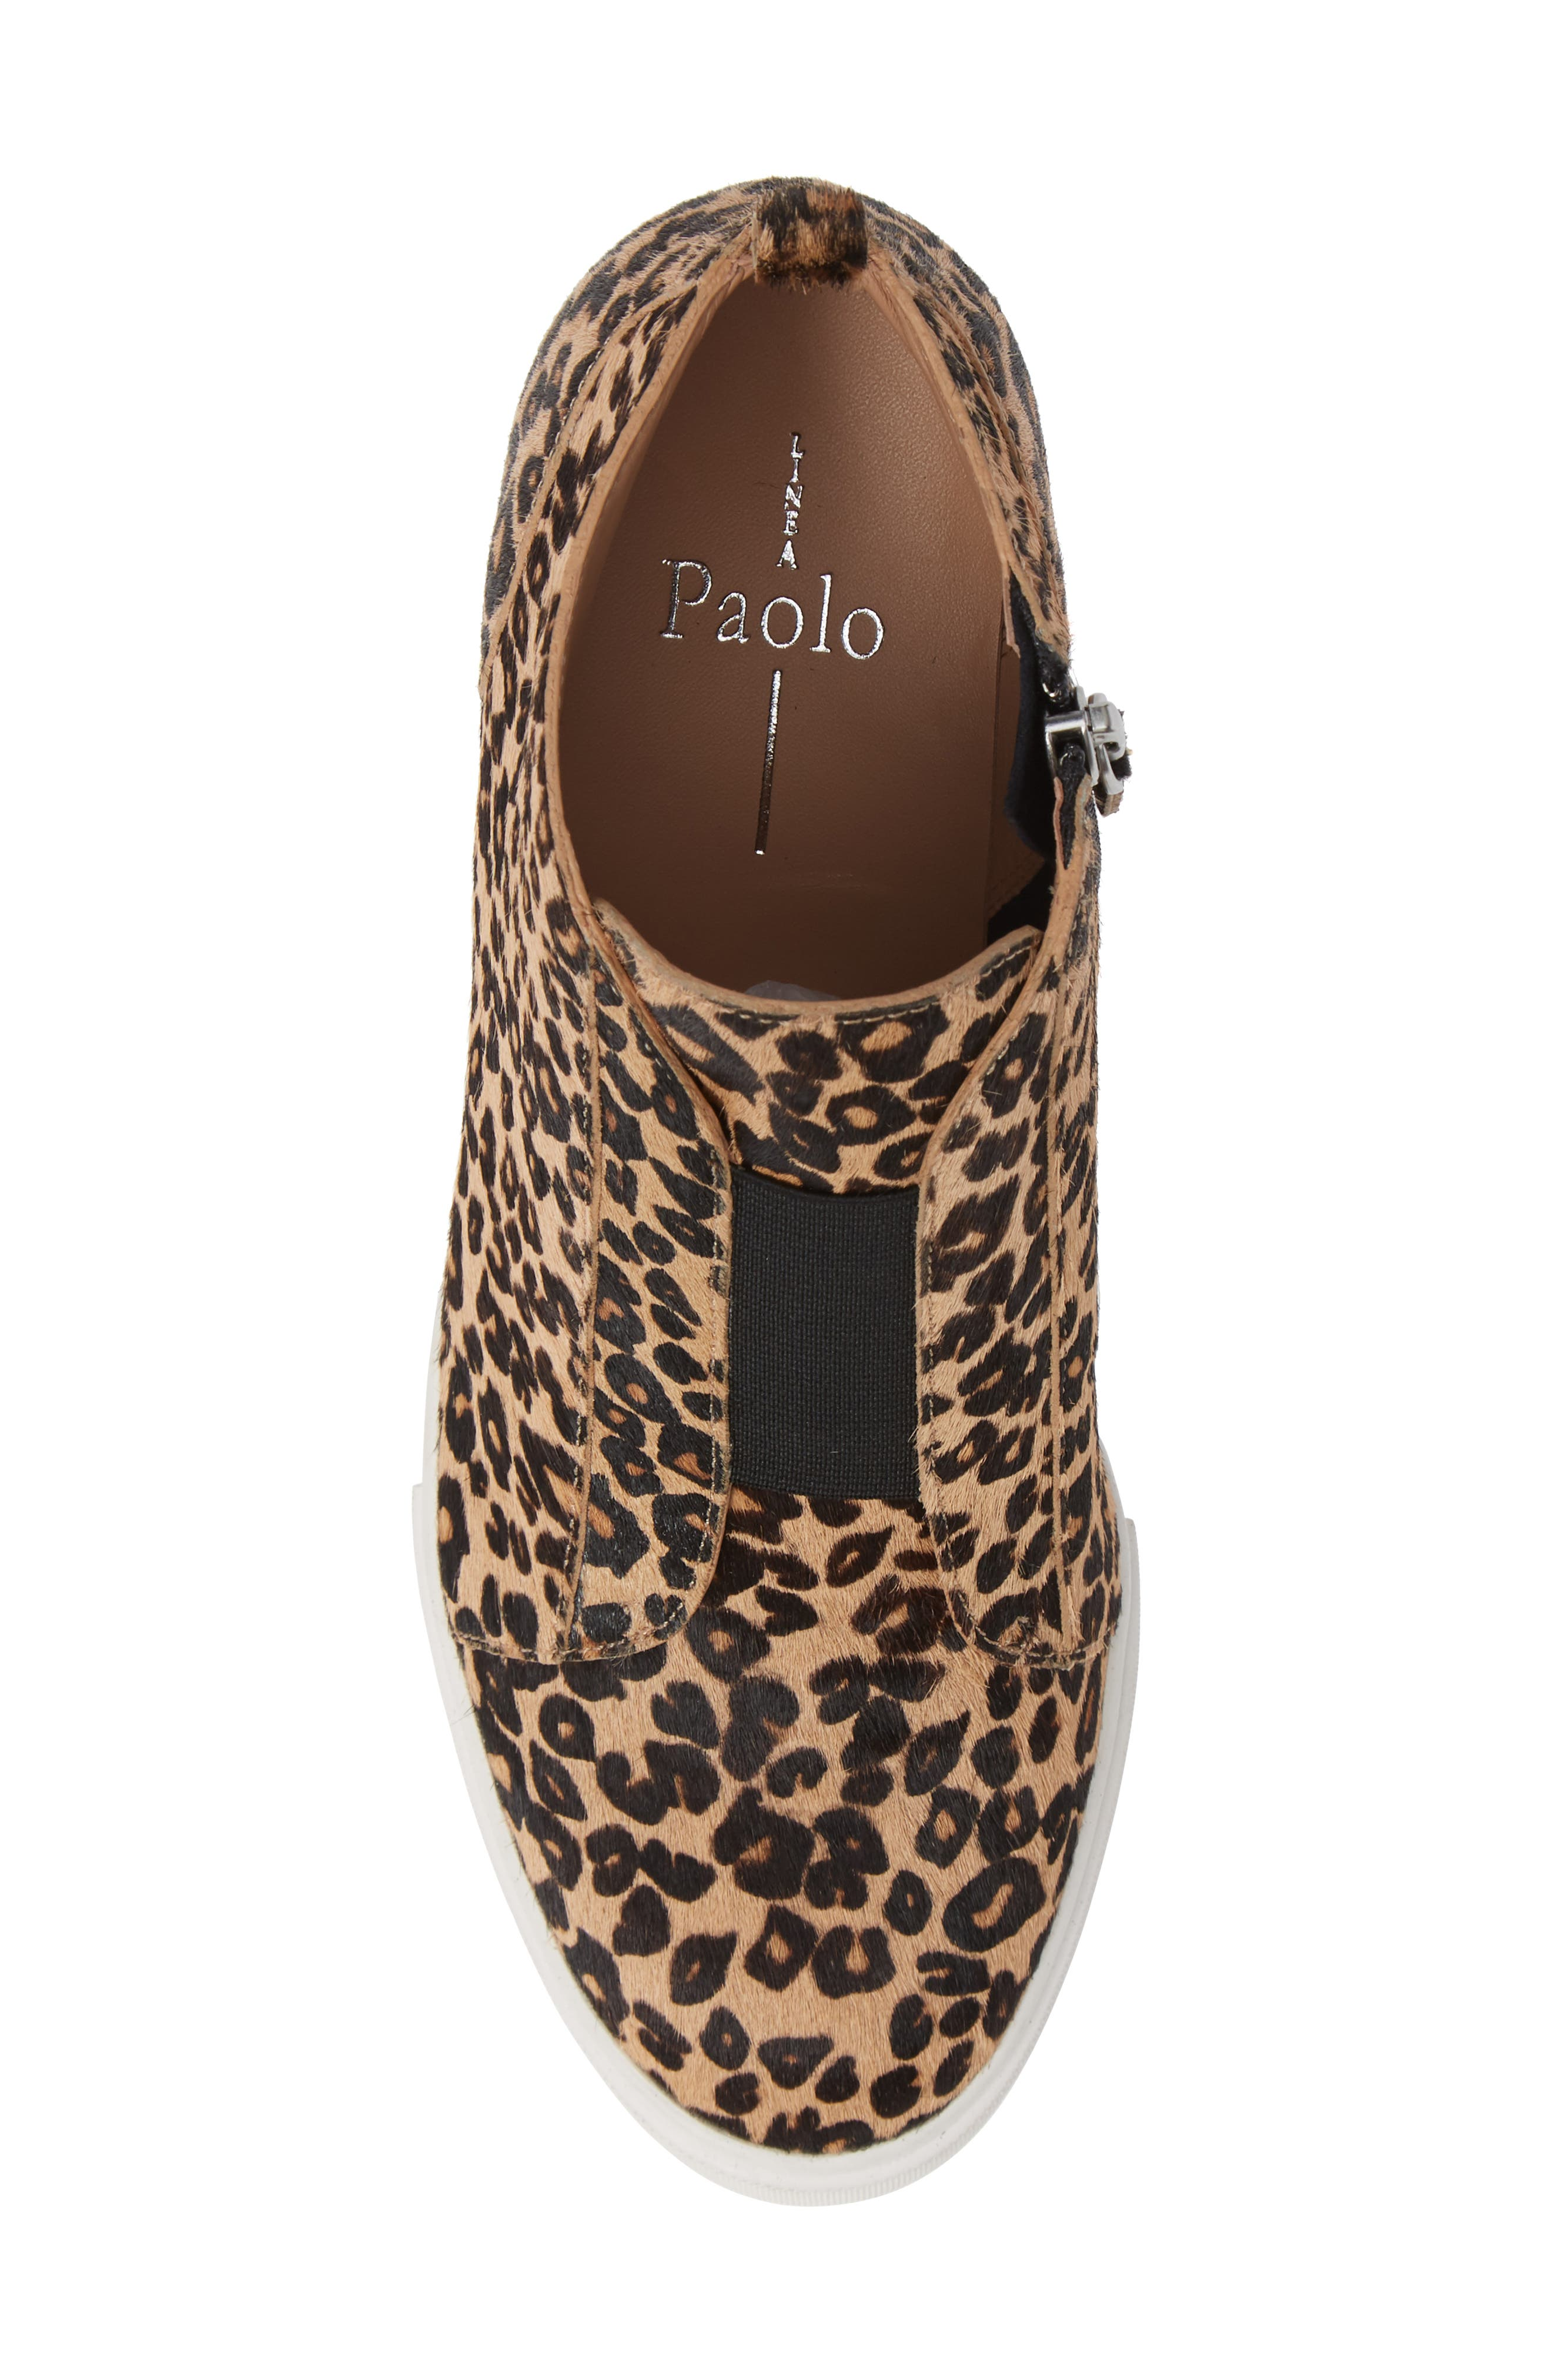 LINEA PAOLO, Felicia III Genuine Calf Hair Wedge Sneaker, Alternate thumbnail 5, color, LEOPARD PRINT HAIR CALF